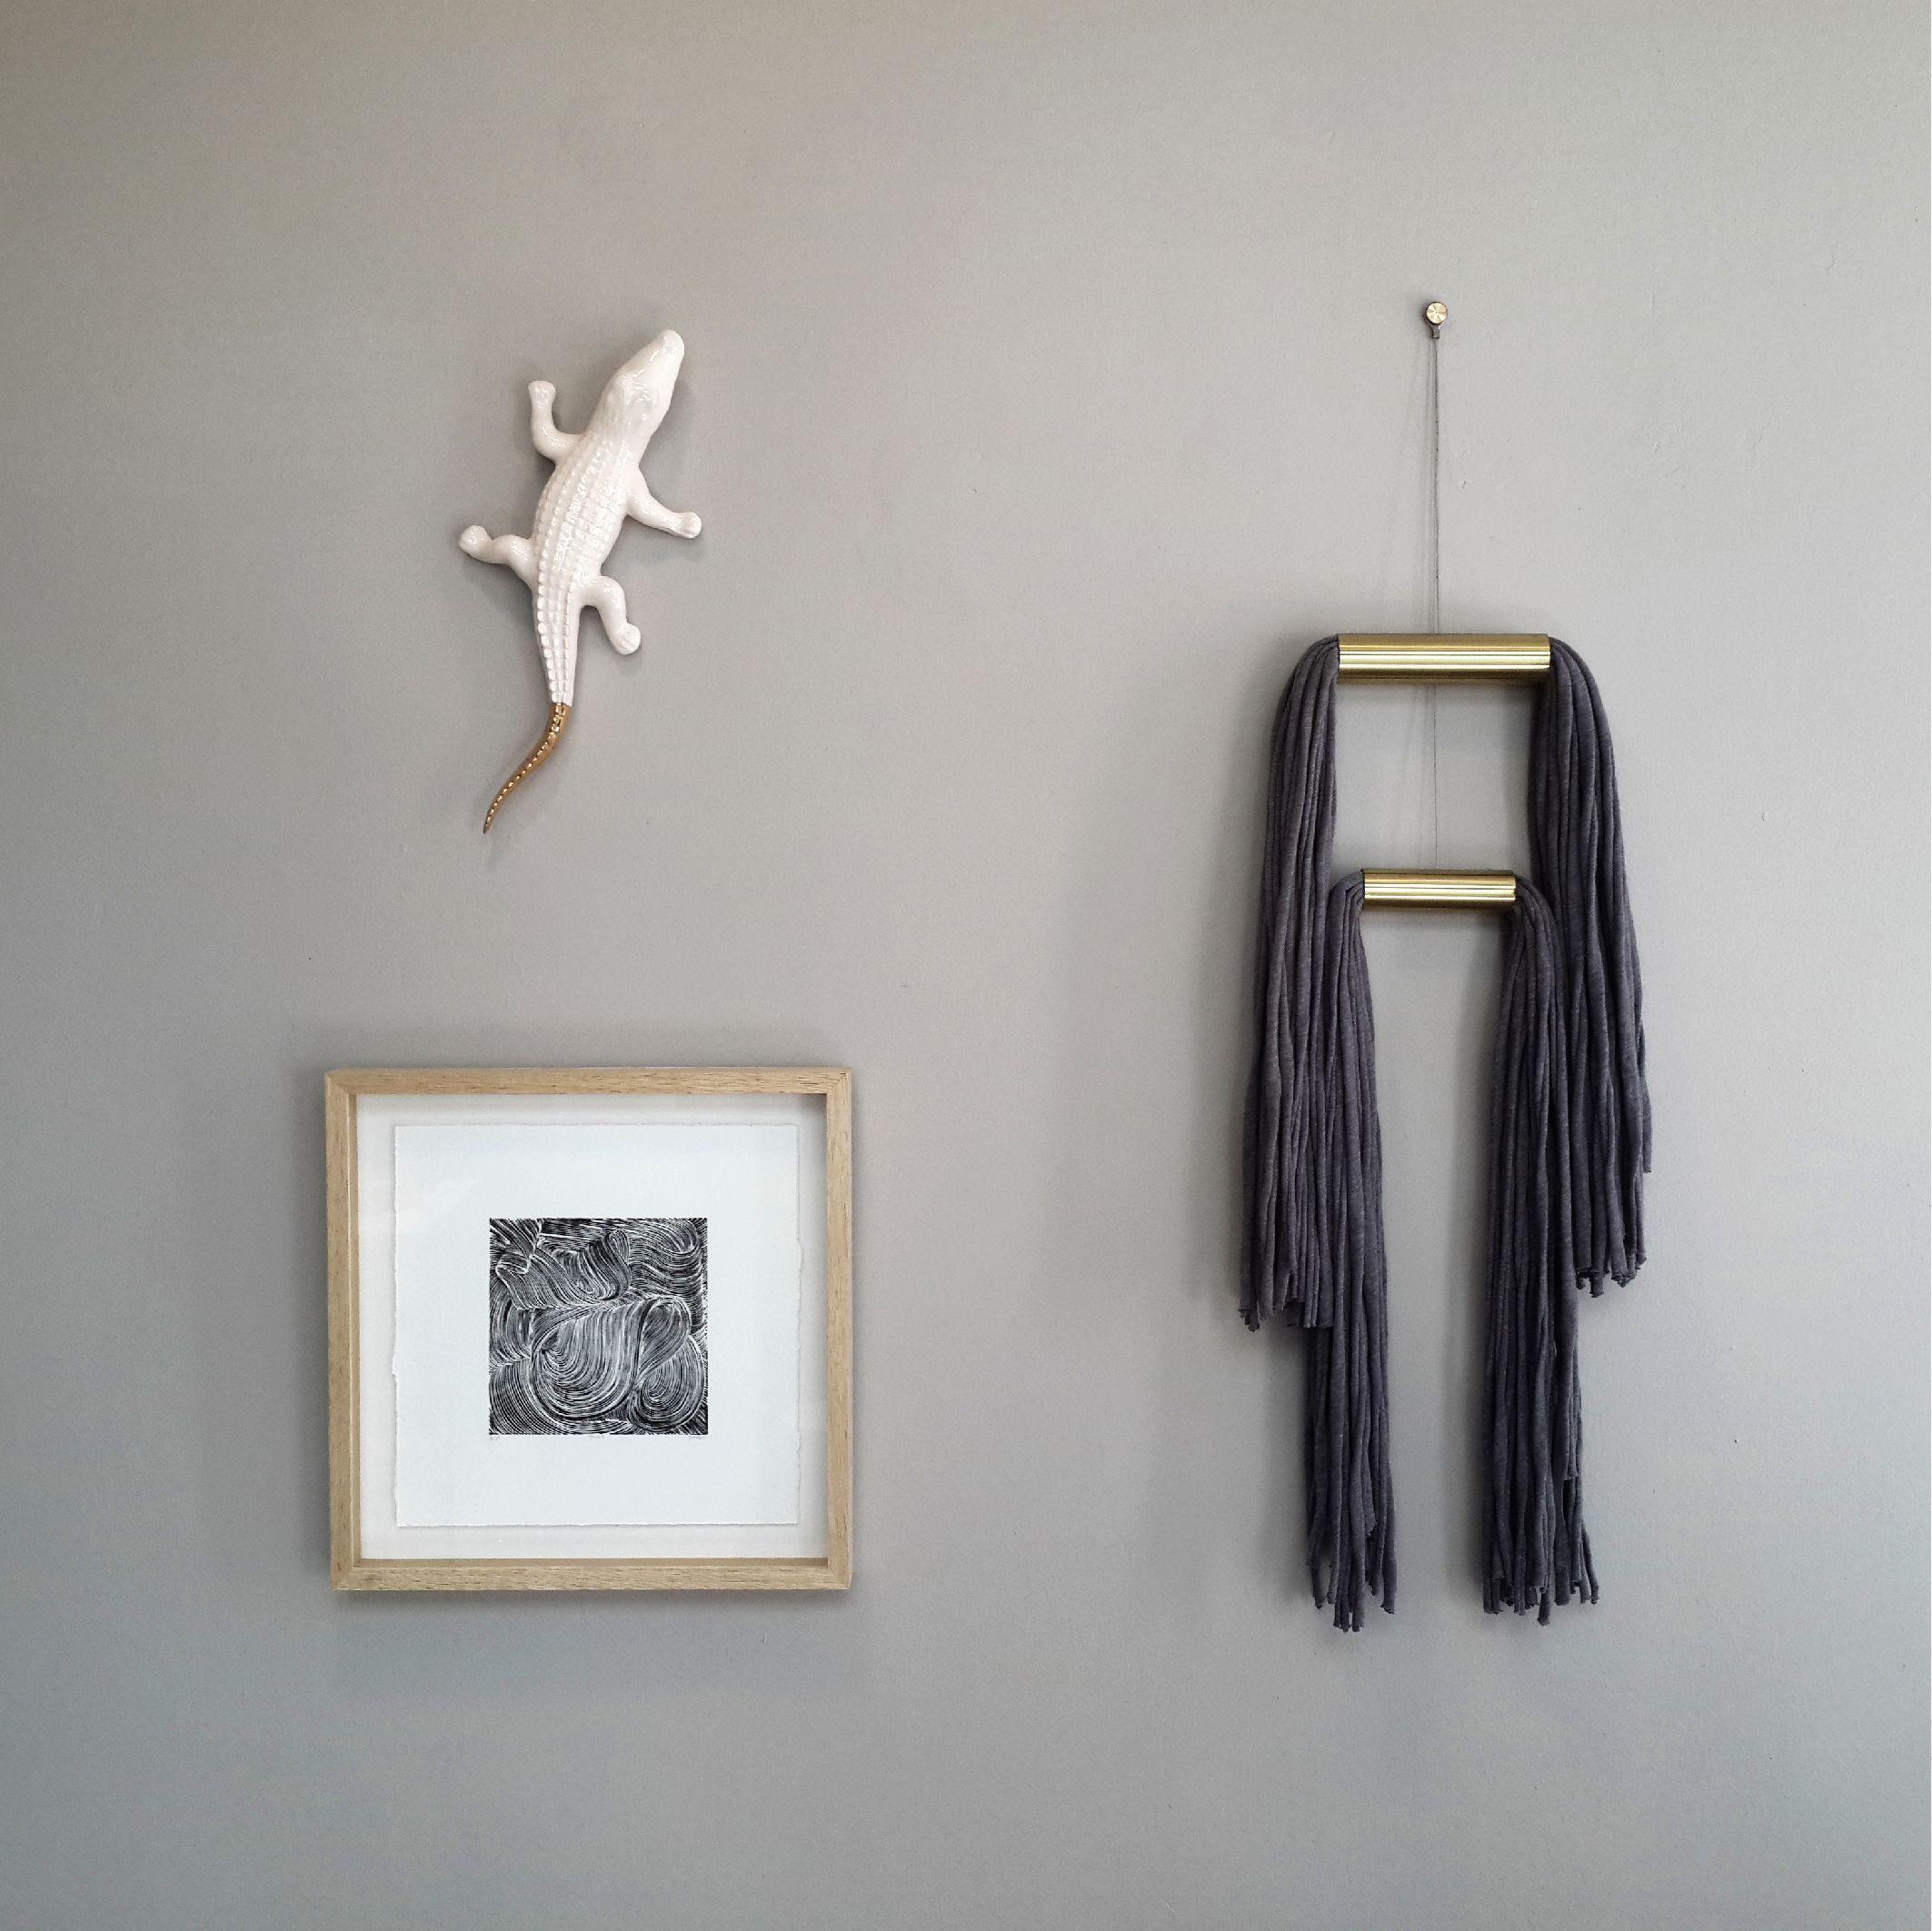 D Wall Hanging Brush I Linocut Art Series Ceramic Crocodile